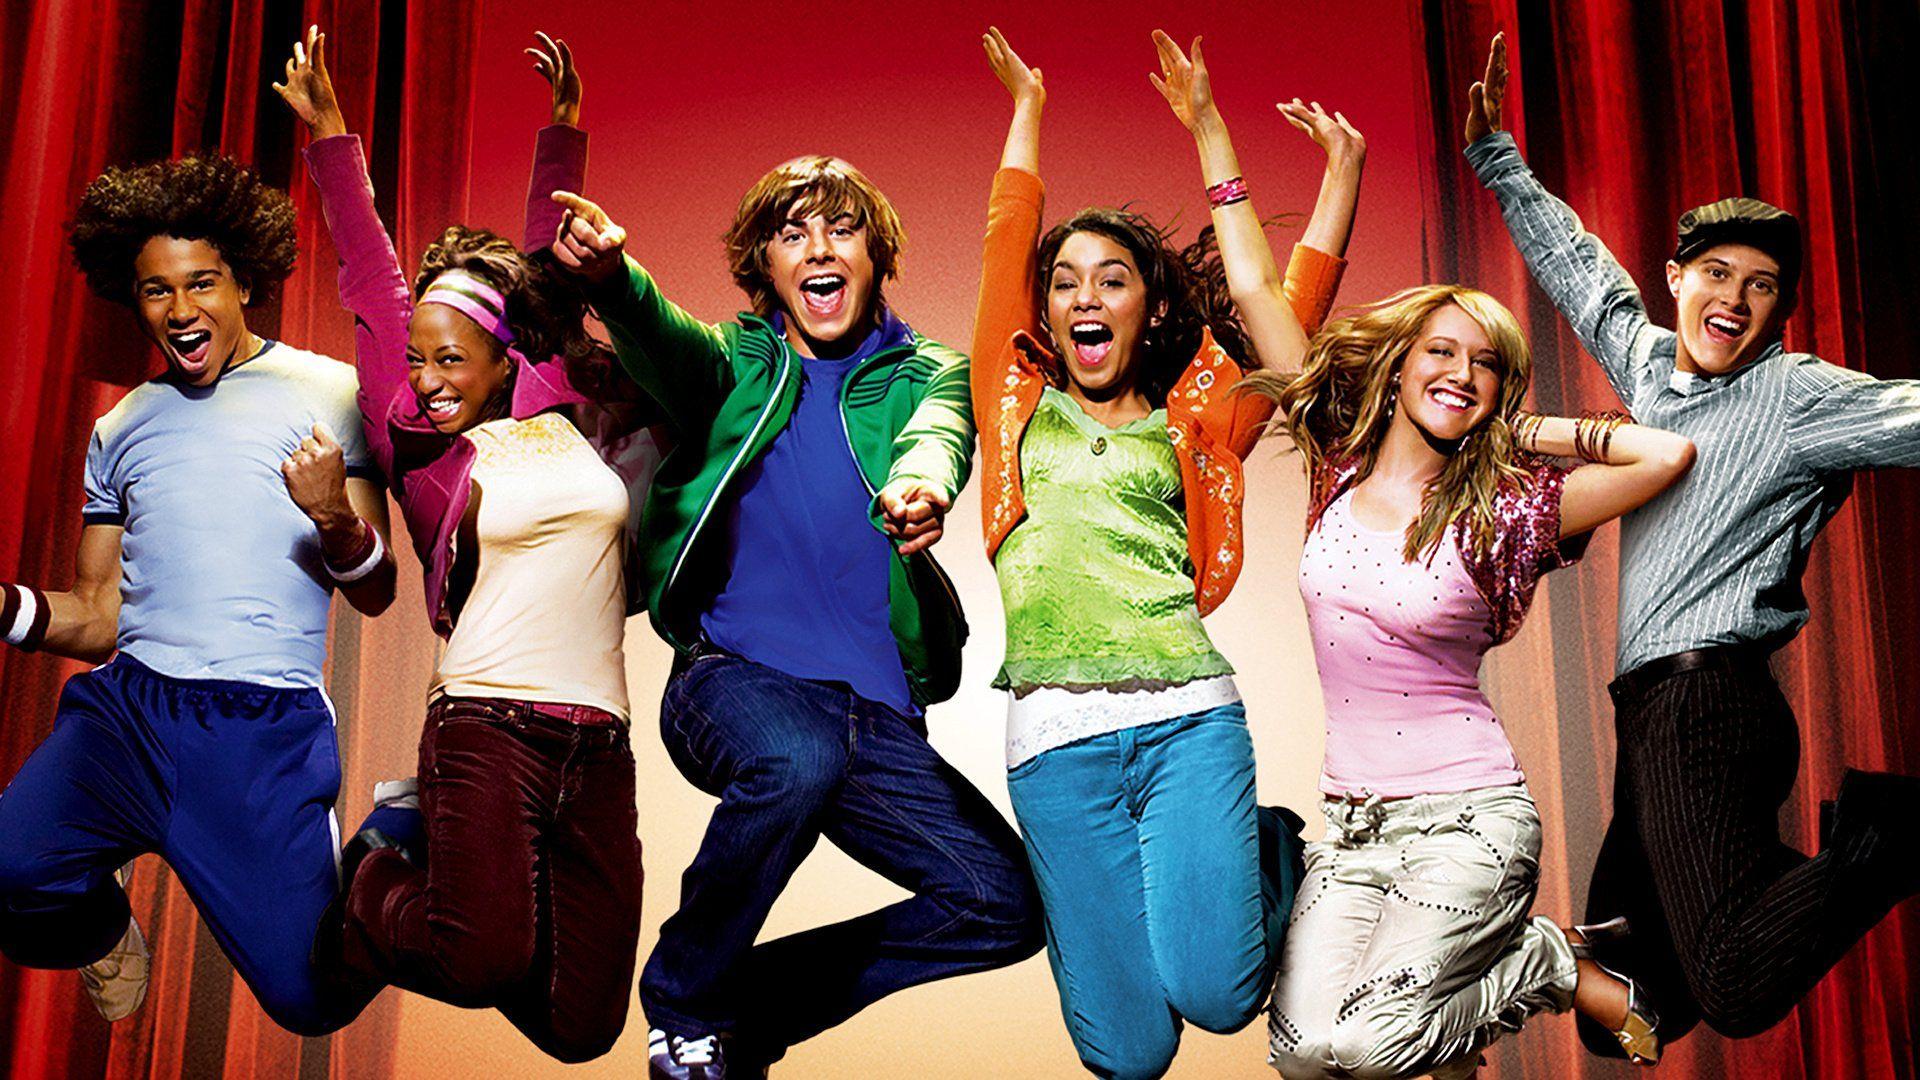 Stretnutie hviezd High School Musical